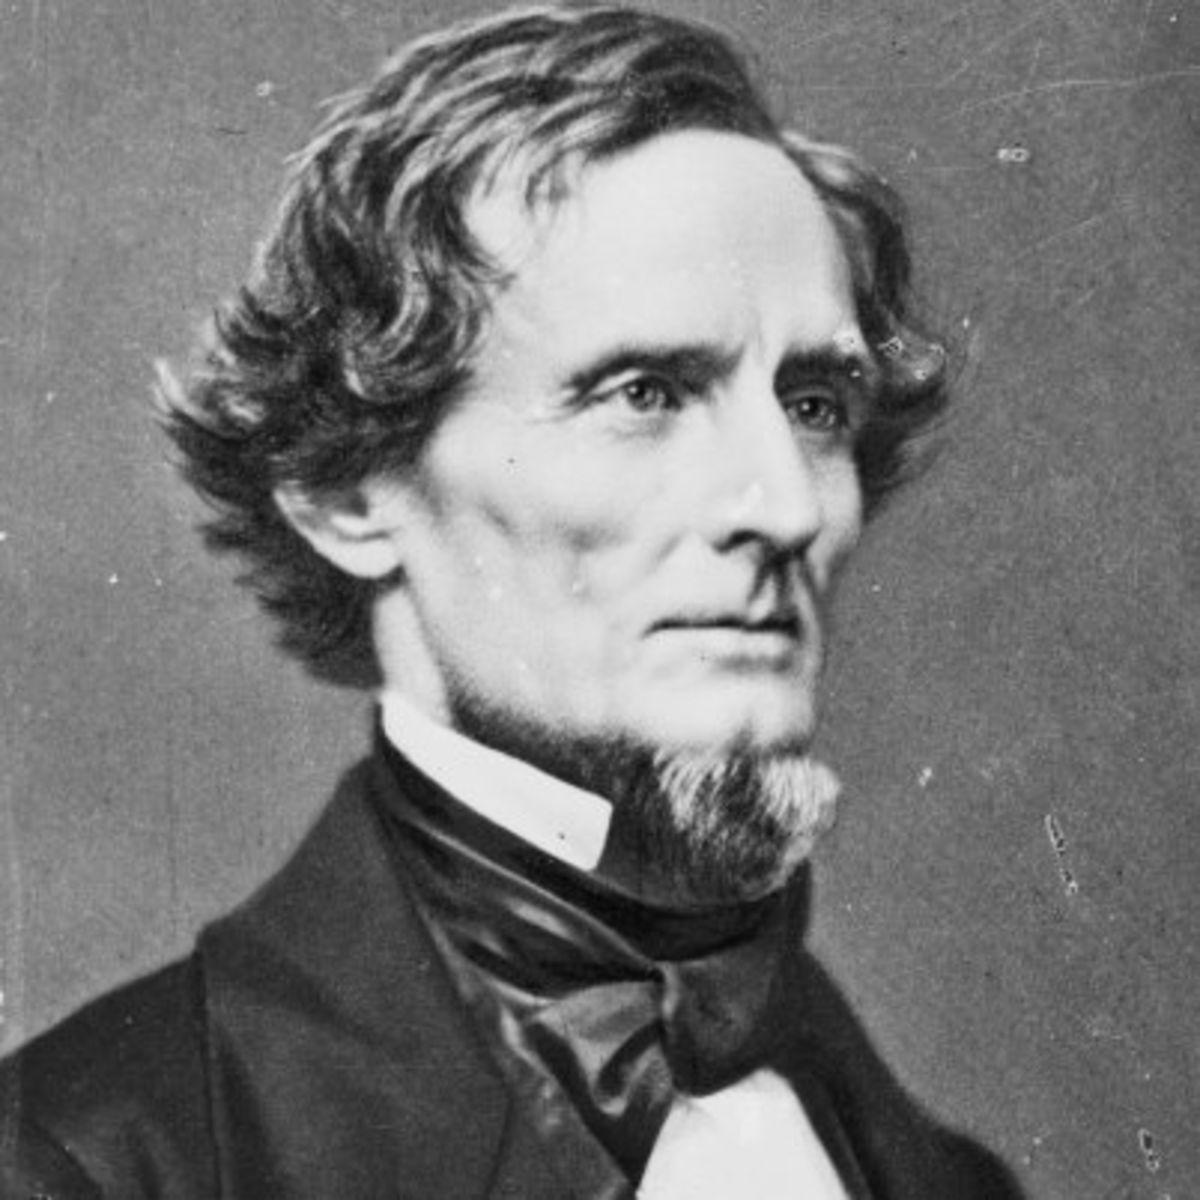 Jefferson Davis-president-Confederacy-Secretary of War-Battle of Buena Vista-Fort Sumter-Mississippi-Brierfield Plantation